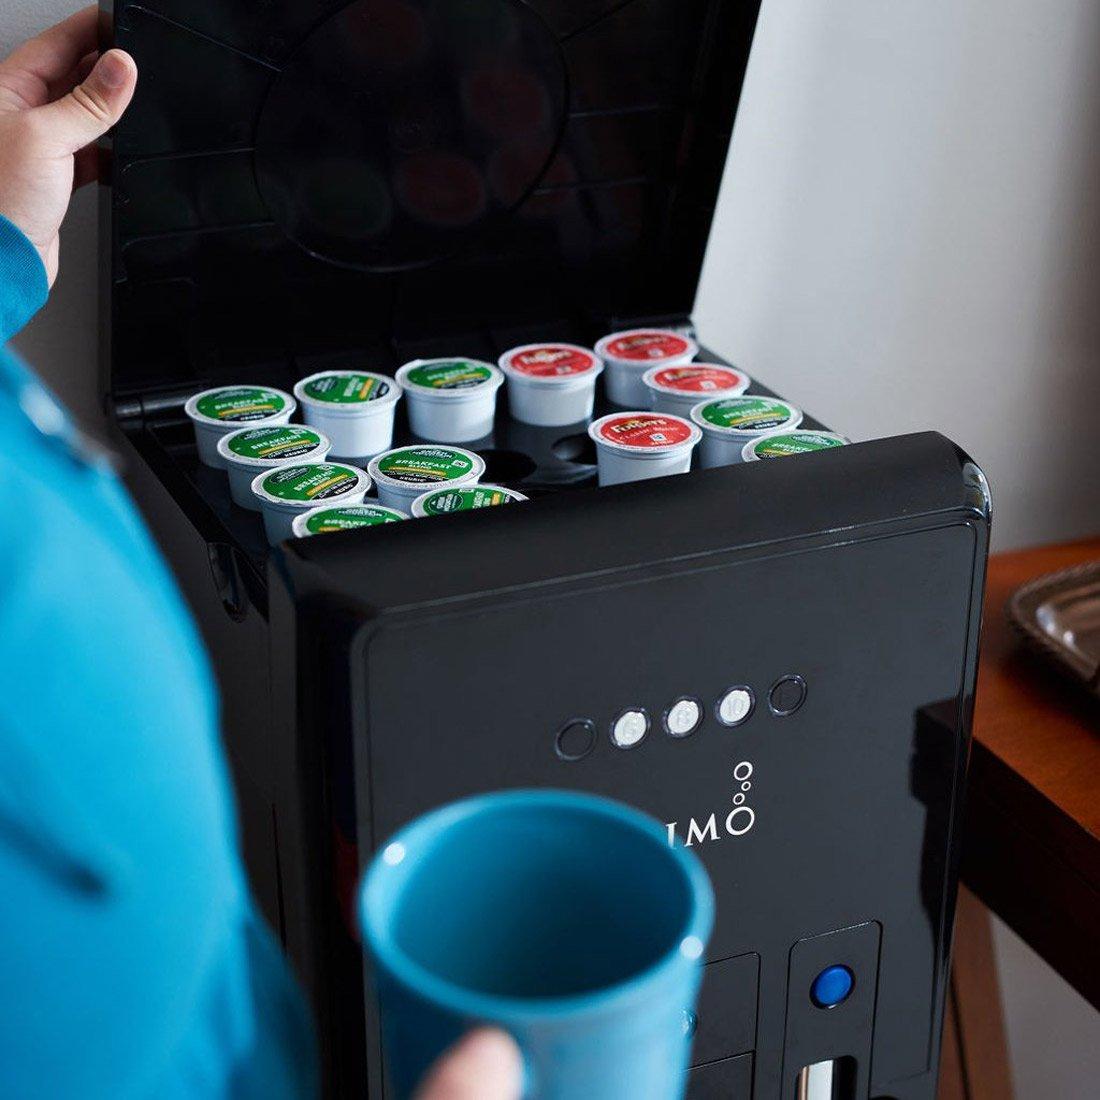 Primo Htrio Water Dispenser With Built In Single Serve